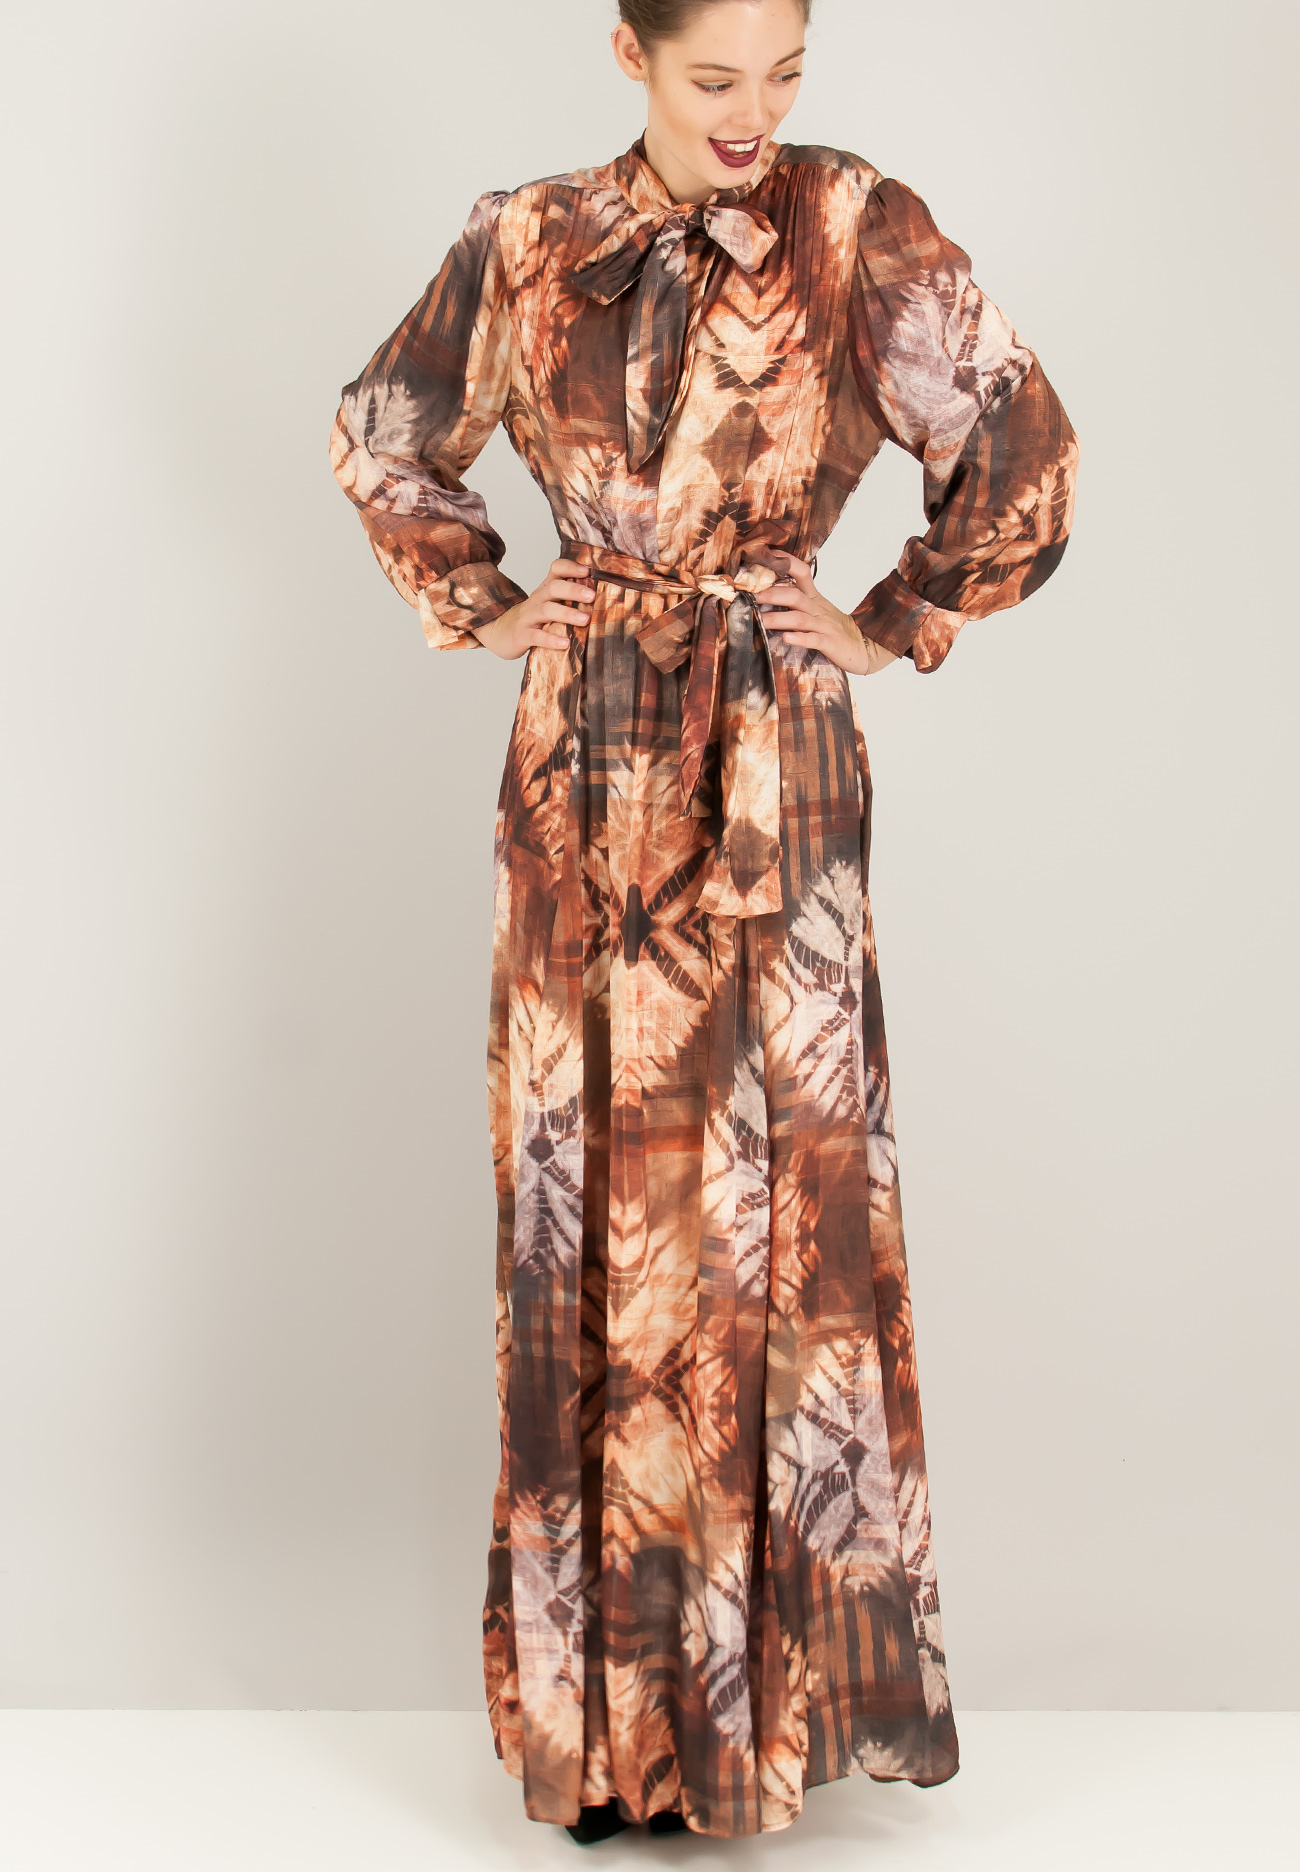 bb7f19c4556a Animal print σατέν φόρεμα - ZIC ZAC